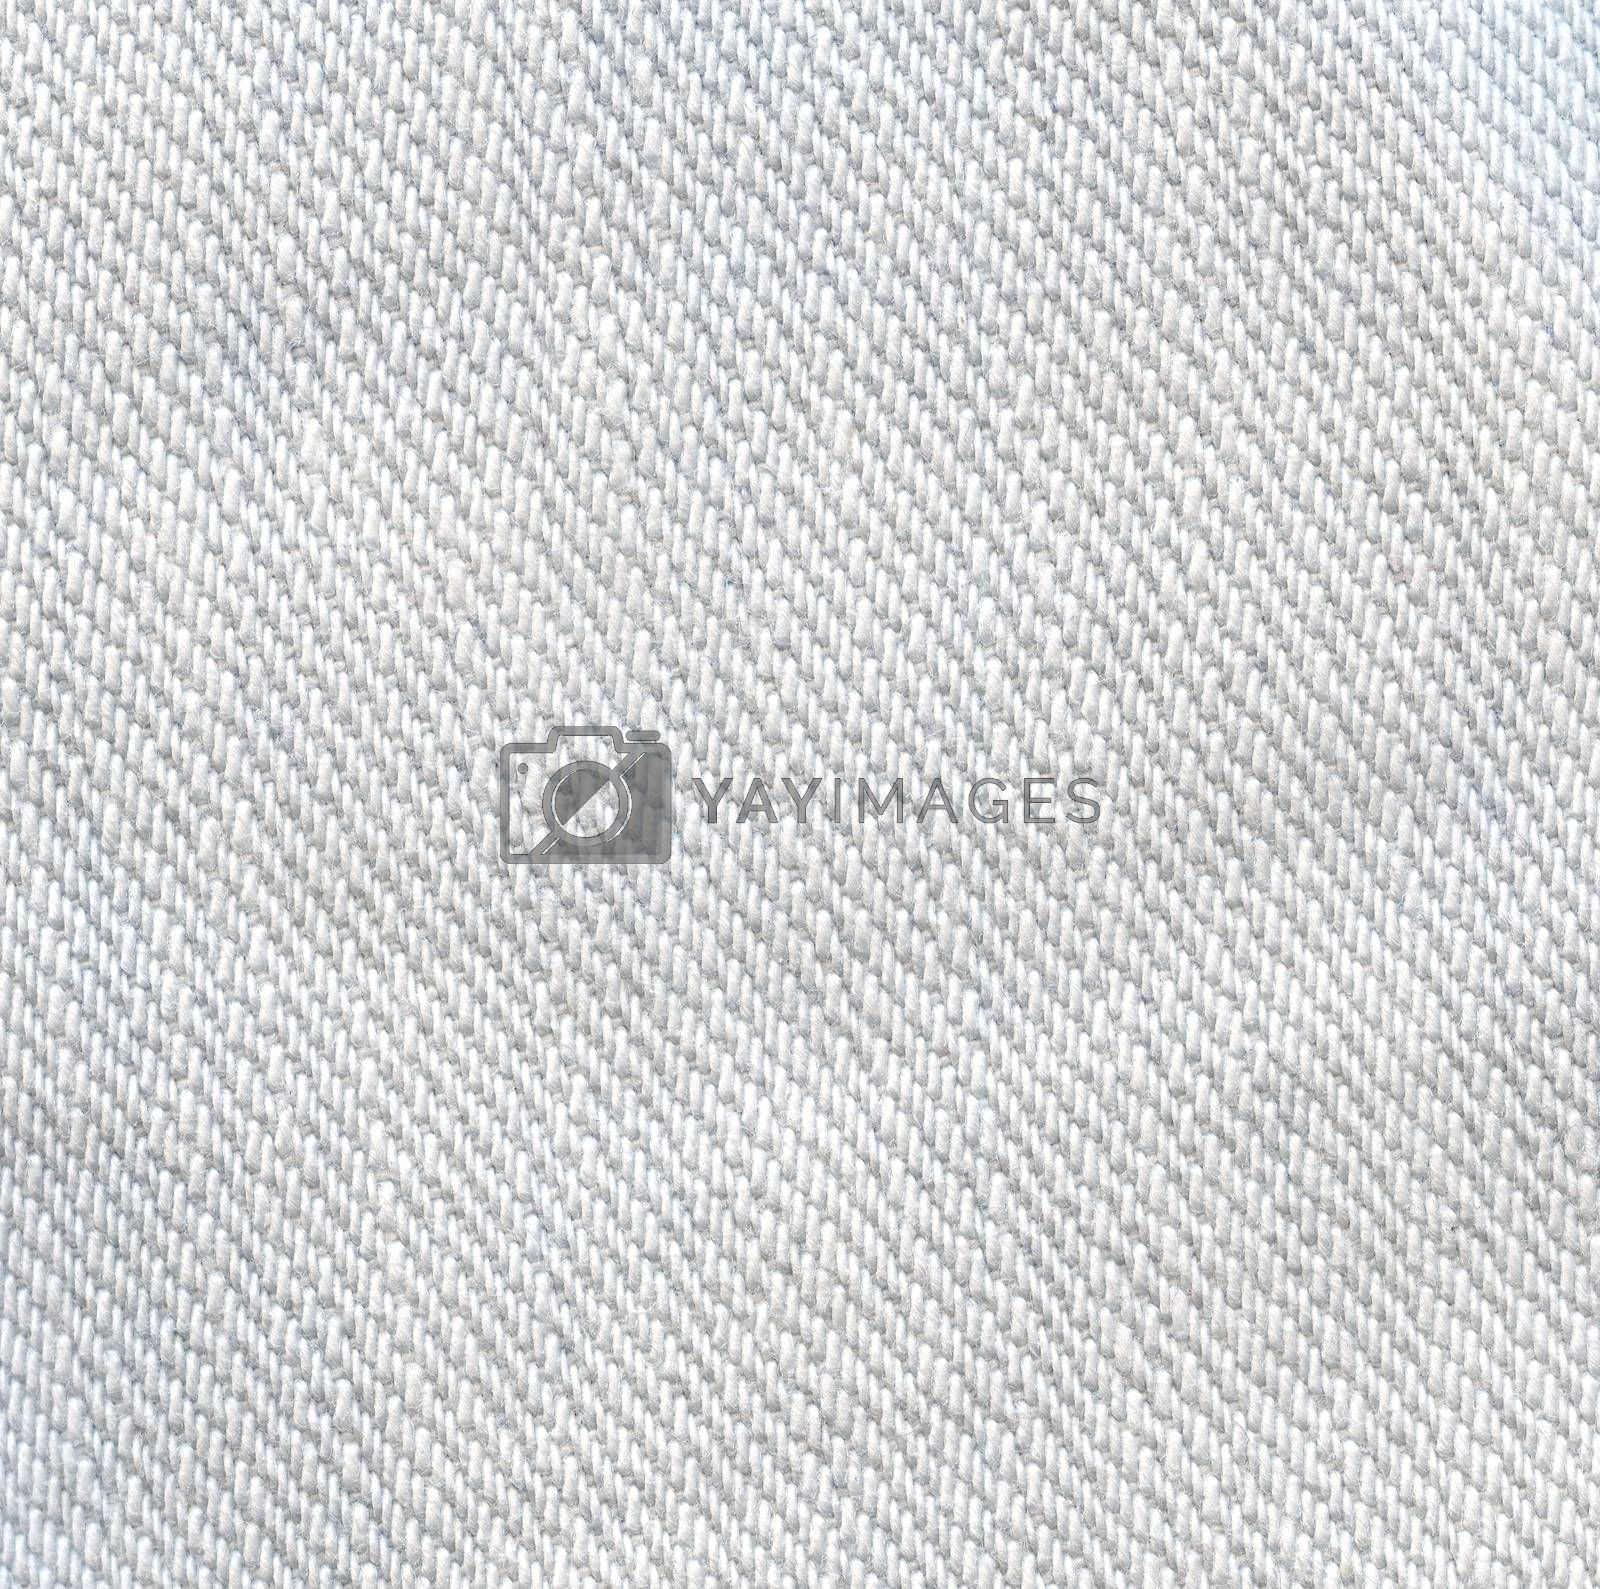 Light jeans texture background. White color canvas.